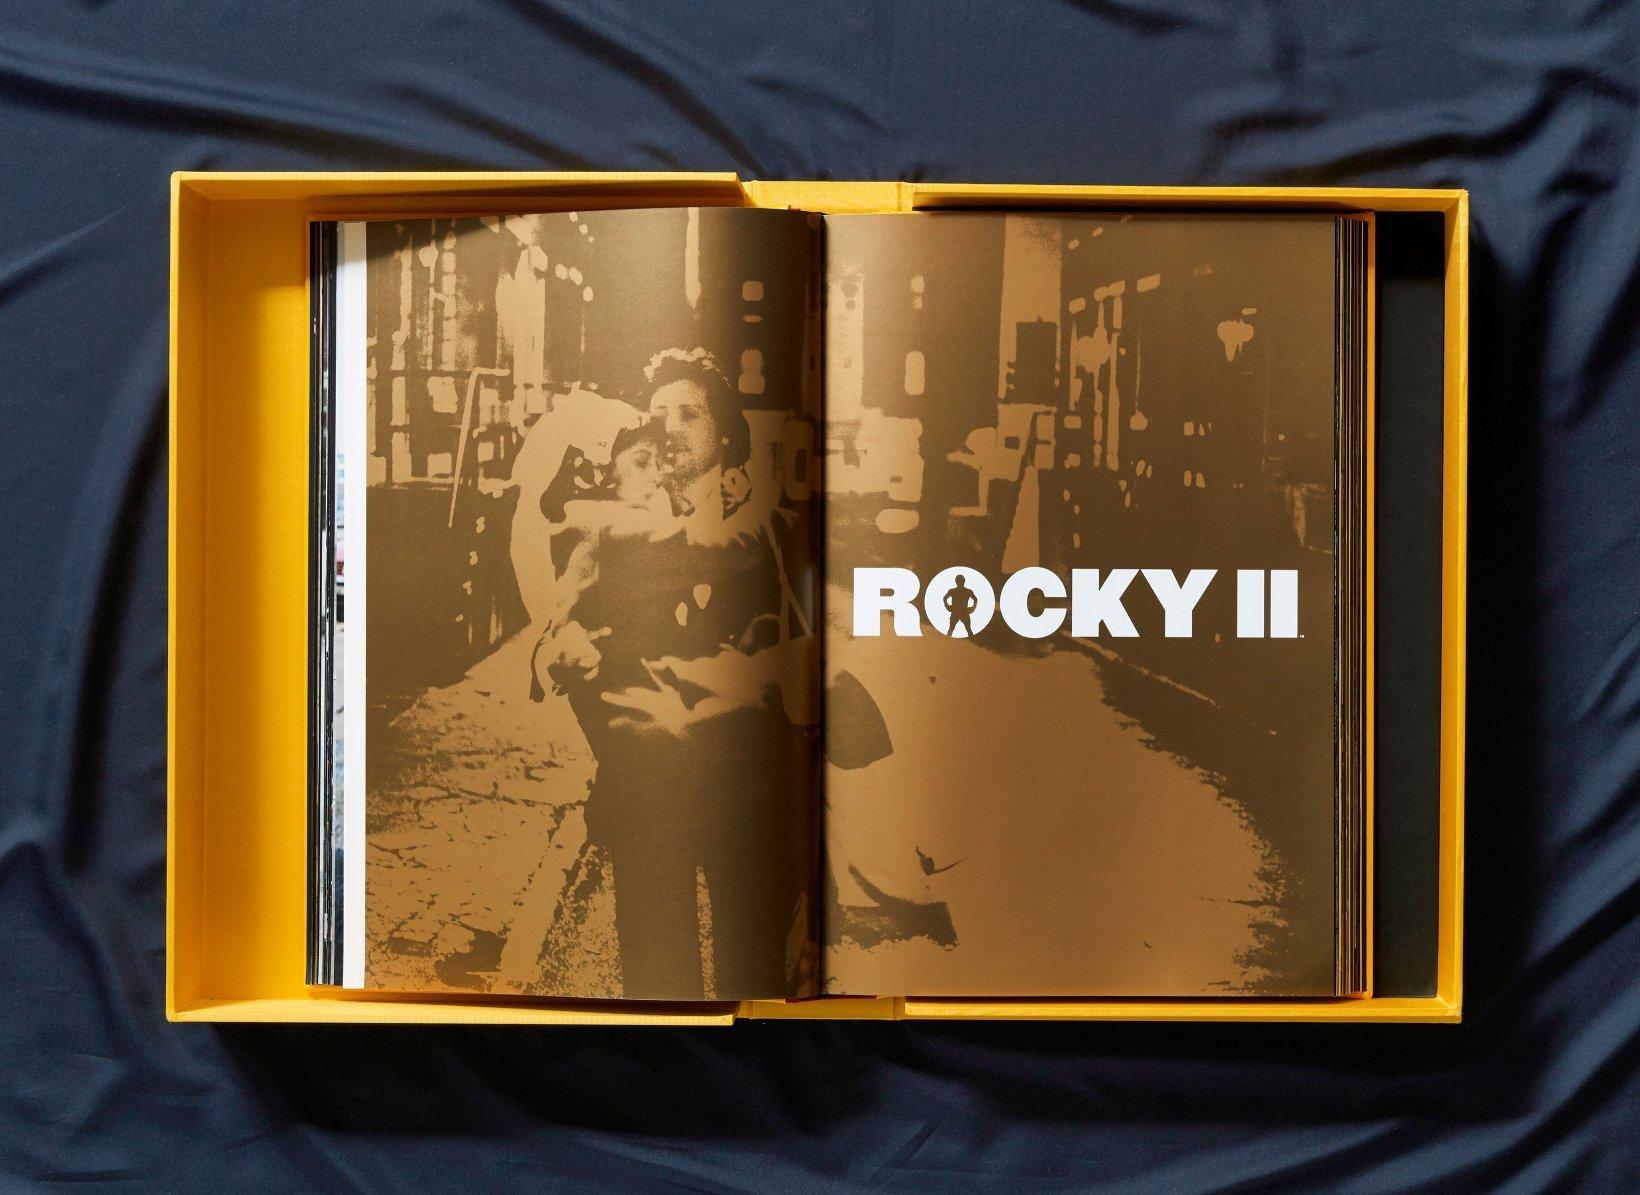 rocky_ce_image_082_083_03144_1812111514_id_1231867 (1).jpg